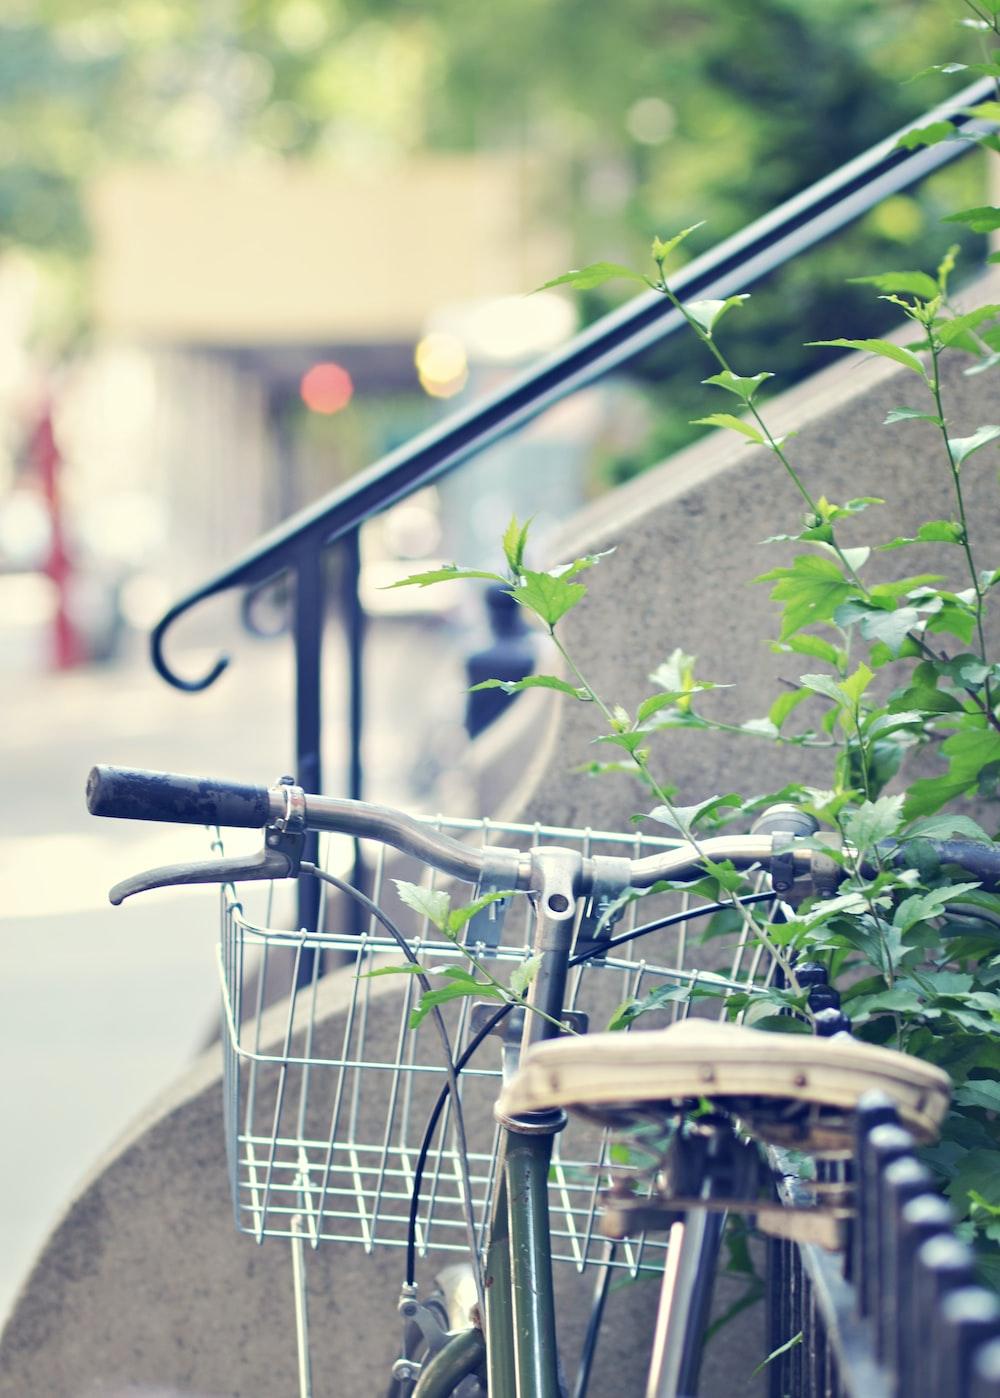 gray city bike parked beside green plants